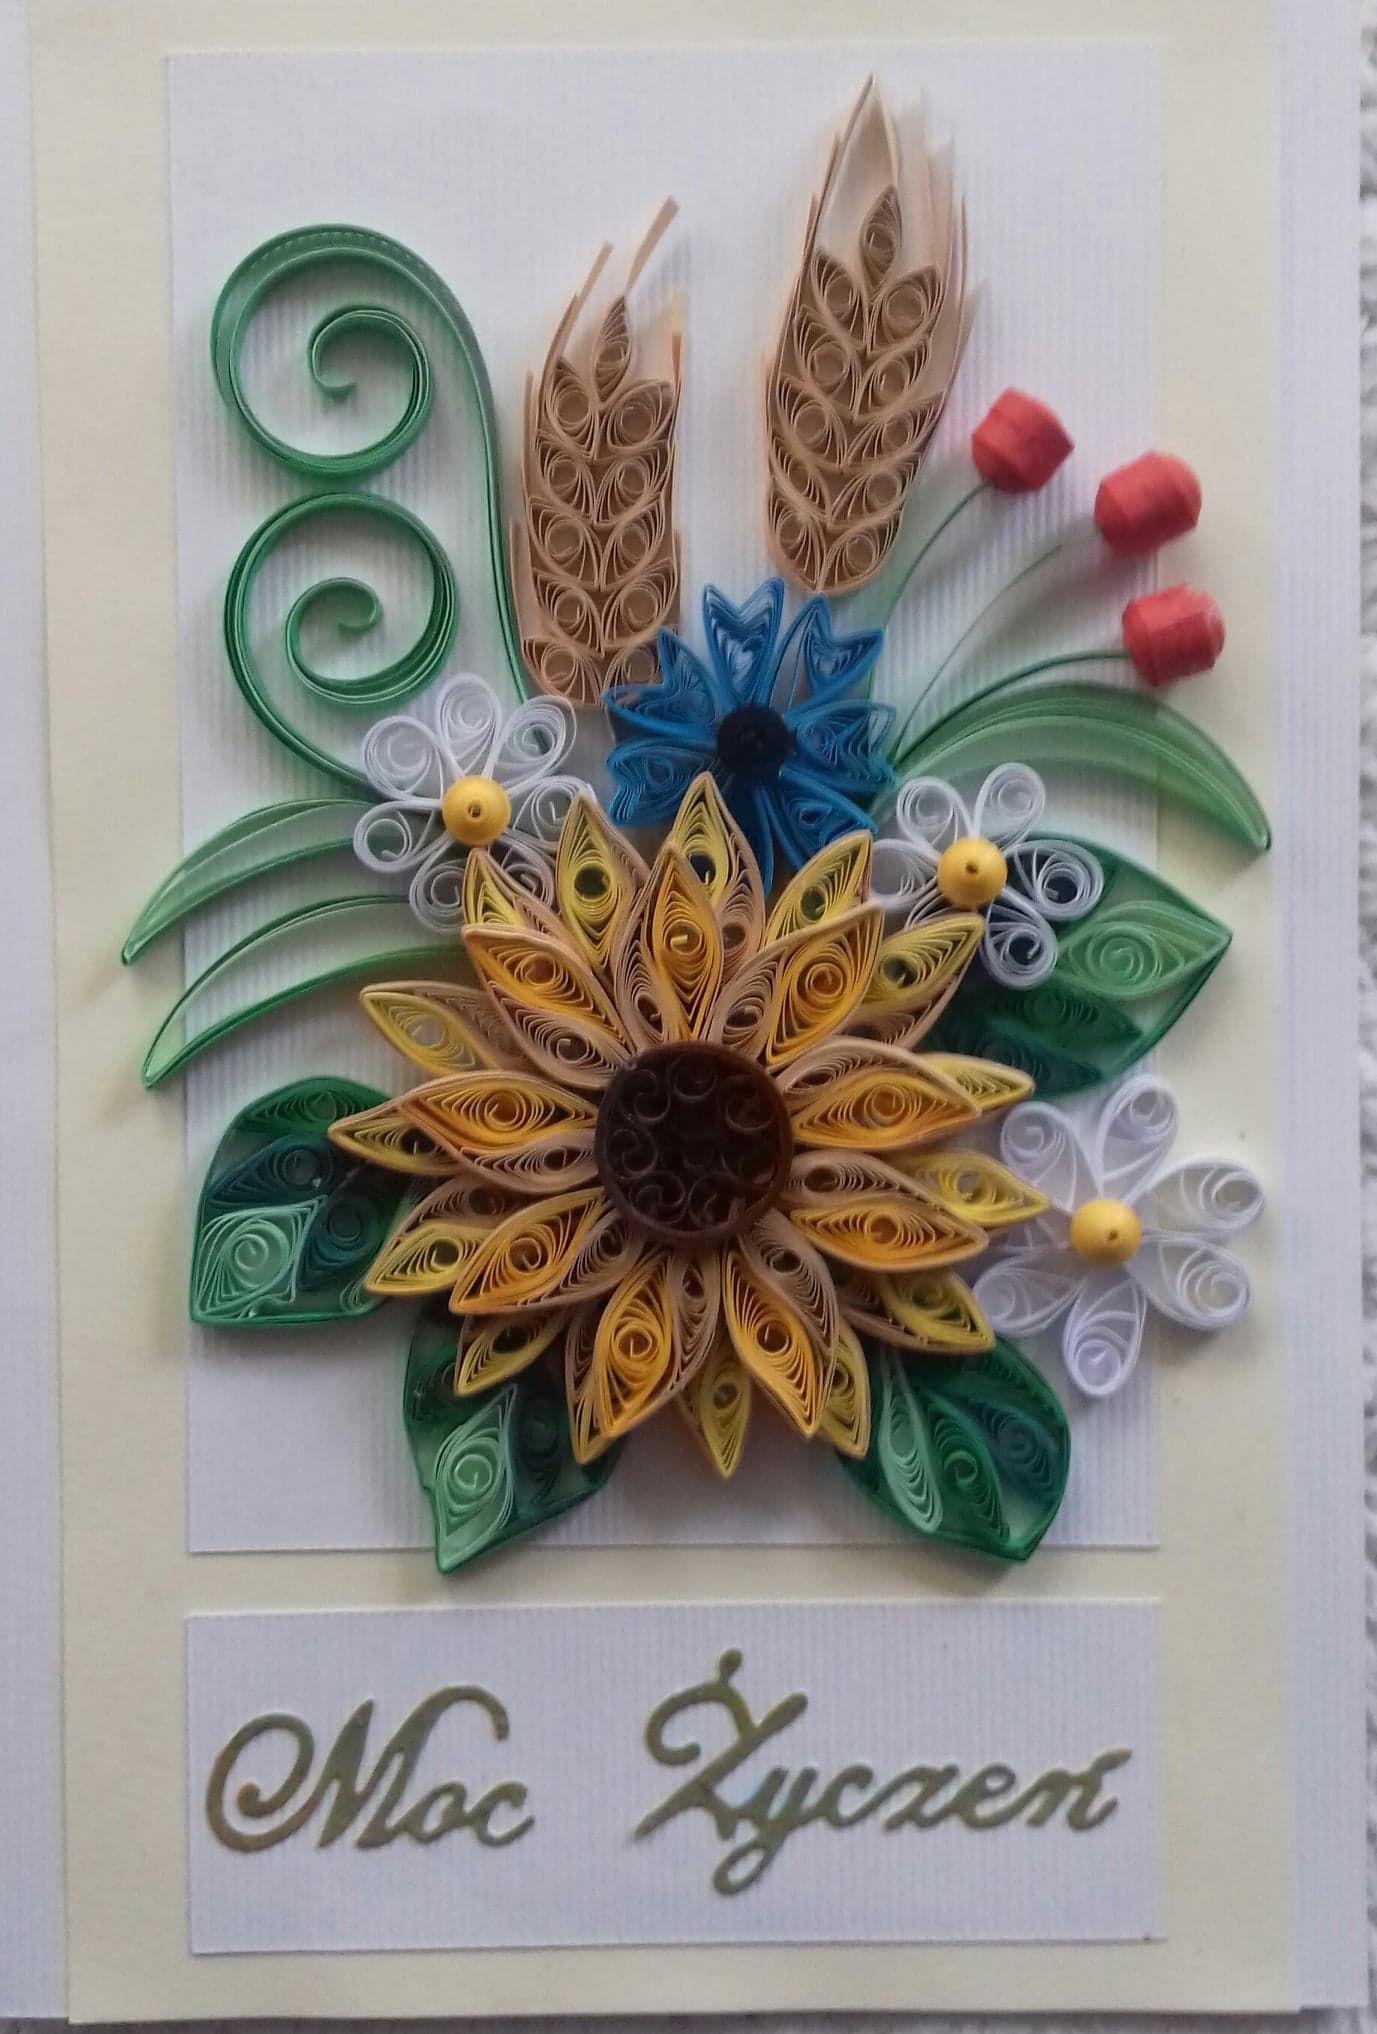 Pin By Elzbieta Wojciechowska On Quilling Kartki Okolicznosciowe Quilling Cards Quilling Flowers Paper Quilling